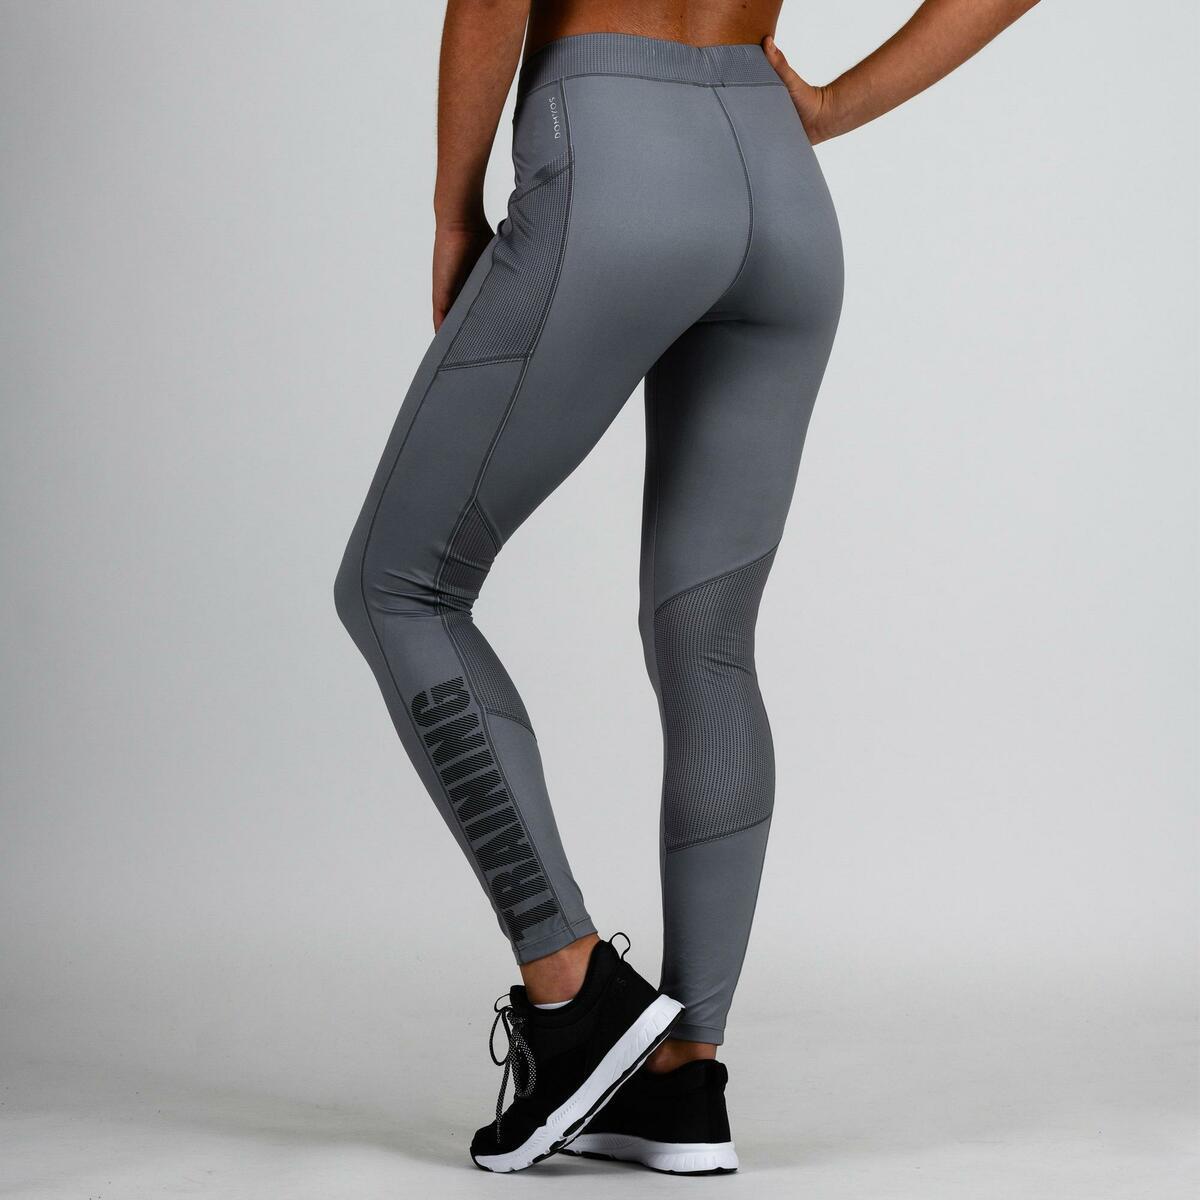 Bild 3 von Leggings FTI 120 Fitness Cardio Damen grau